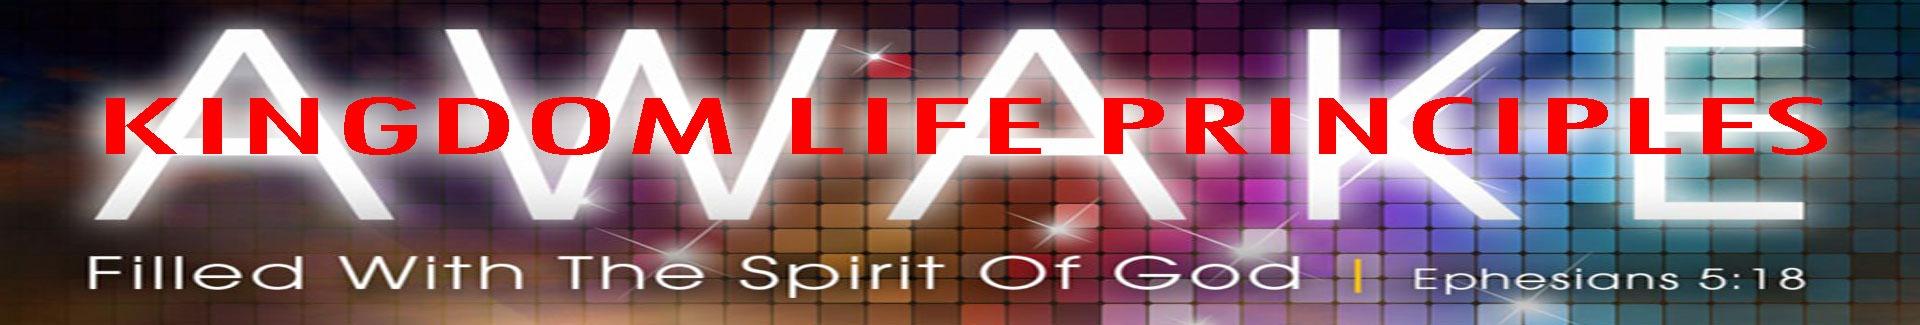 Kingdom Life Principles